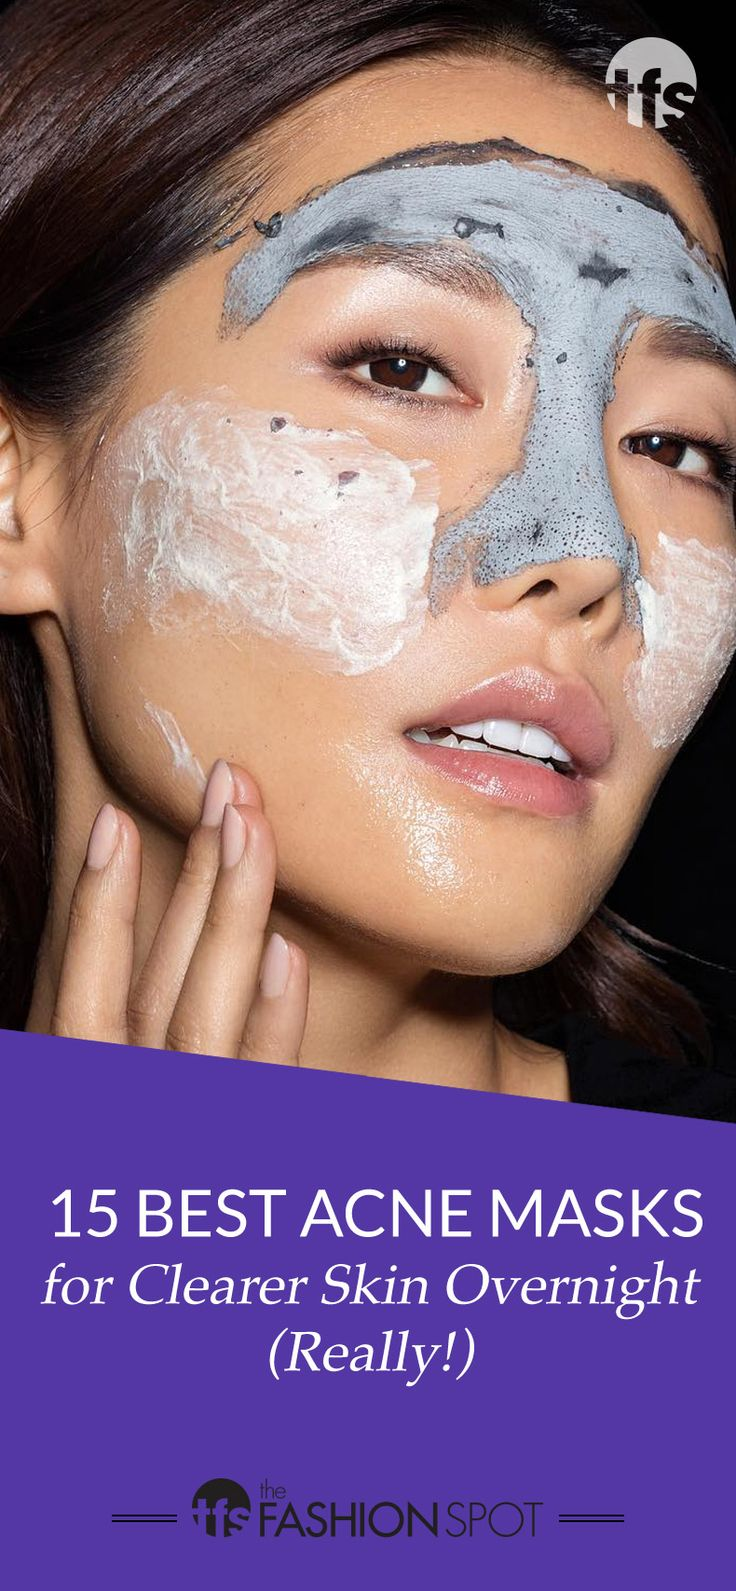 15 Best Acne Masks for Clearer Skin Overnight (Really!)